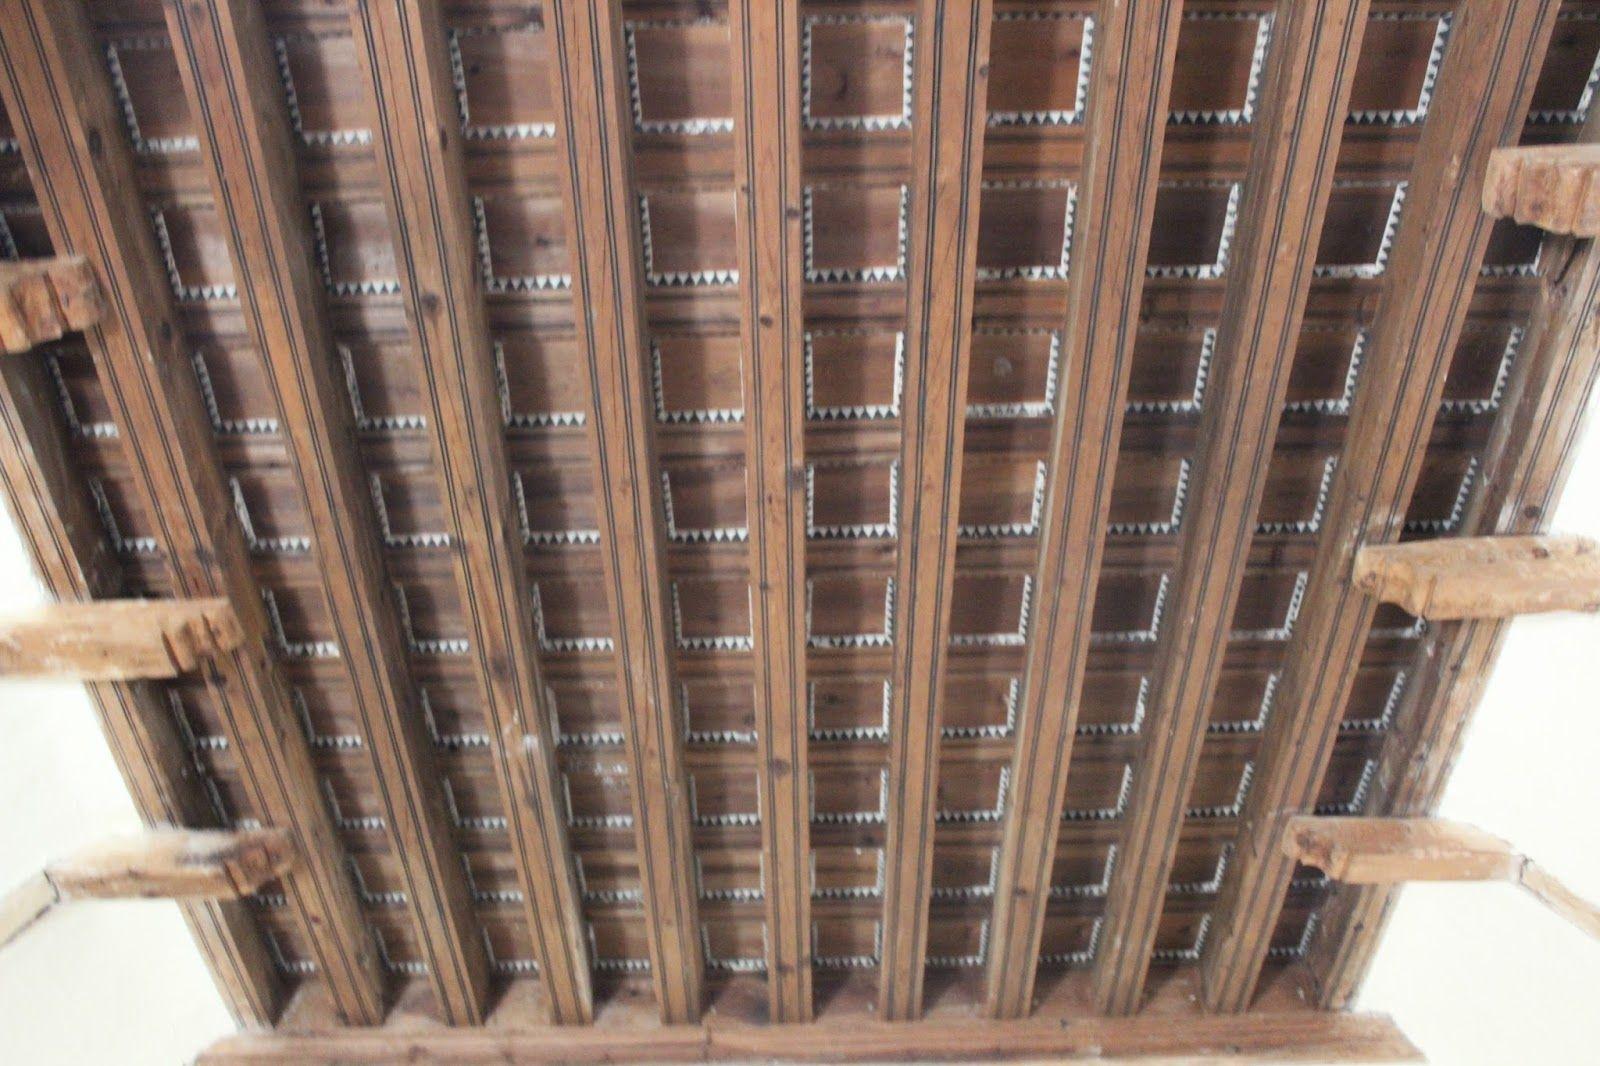 Fuente El Sauz Avila Iglesia De La Asuncion Romanico Mudejar S  # Muebles Mudejar